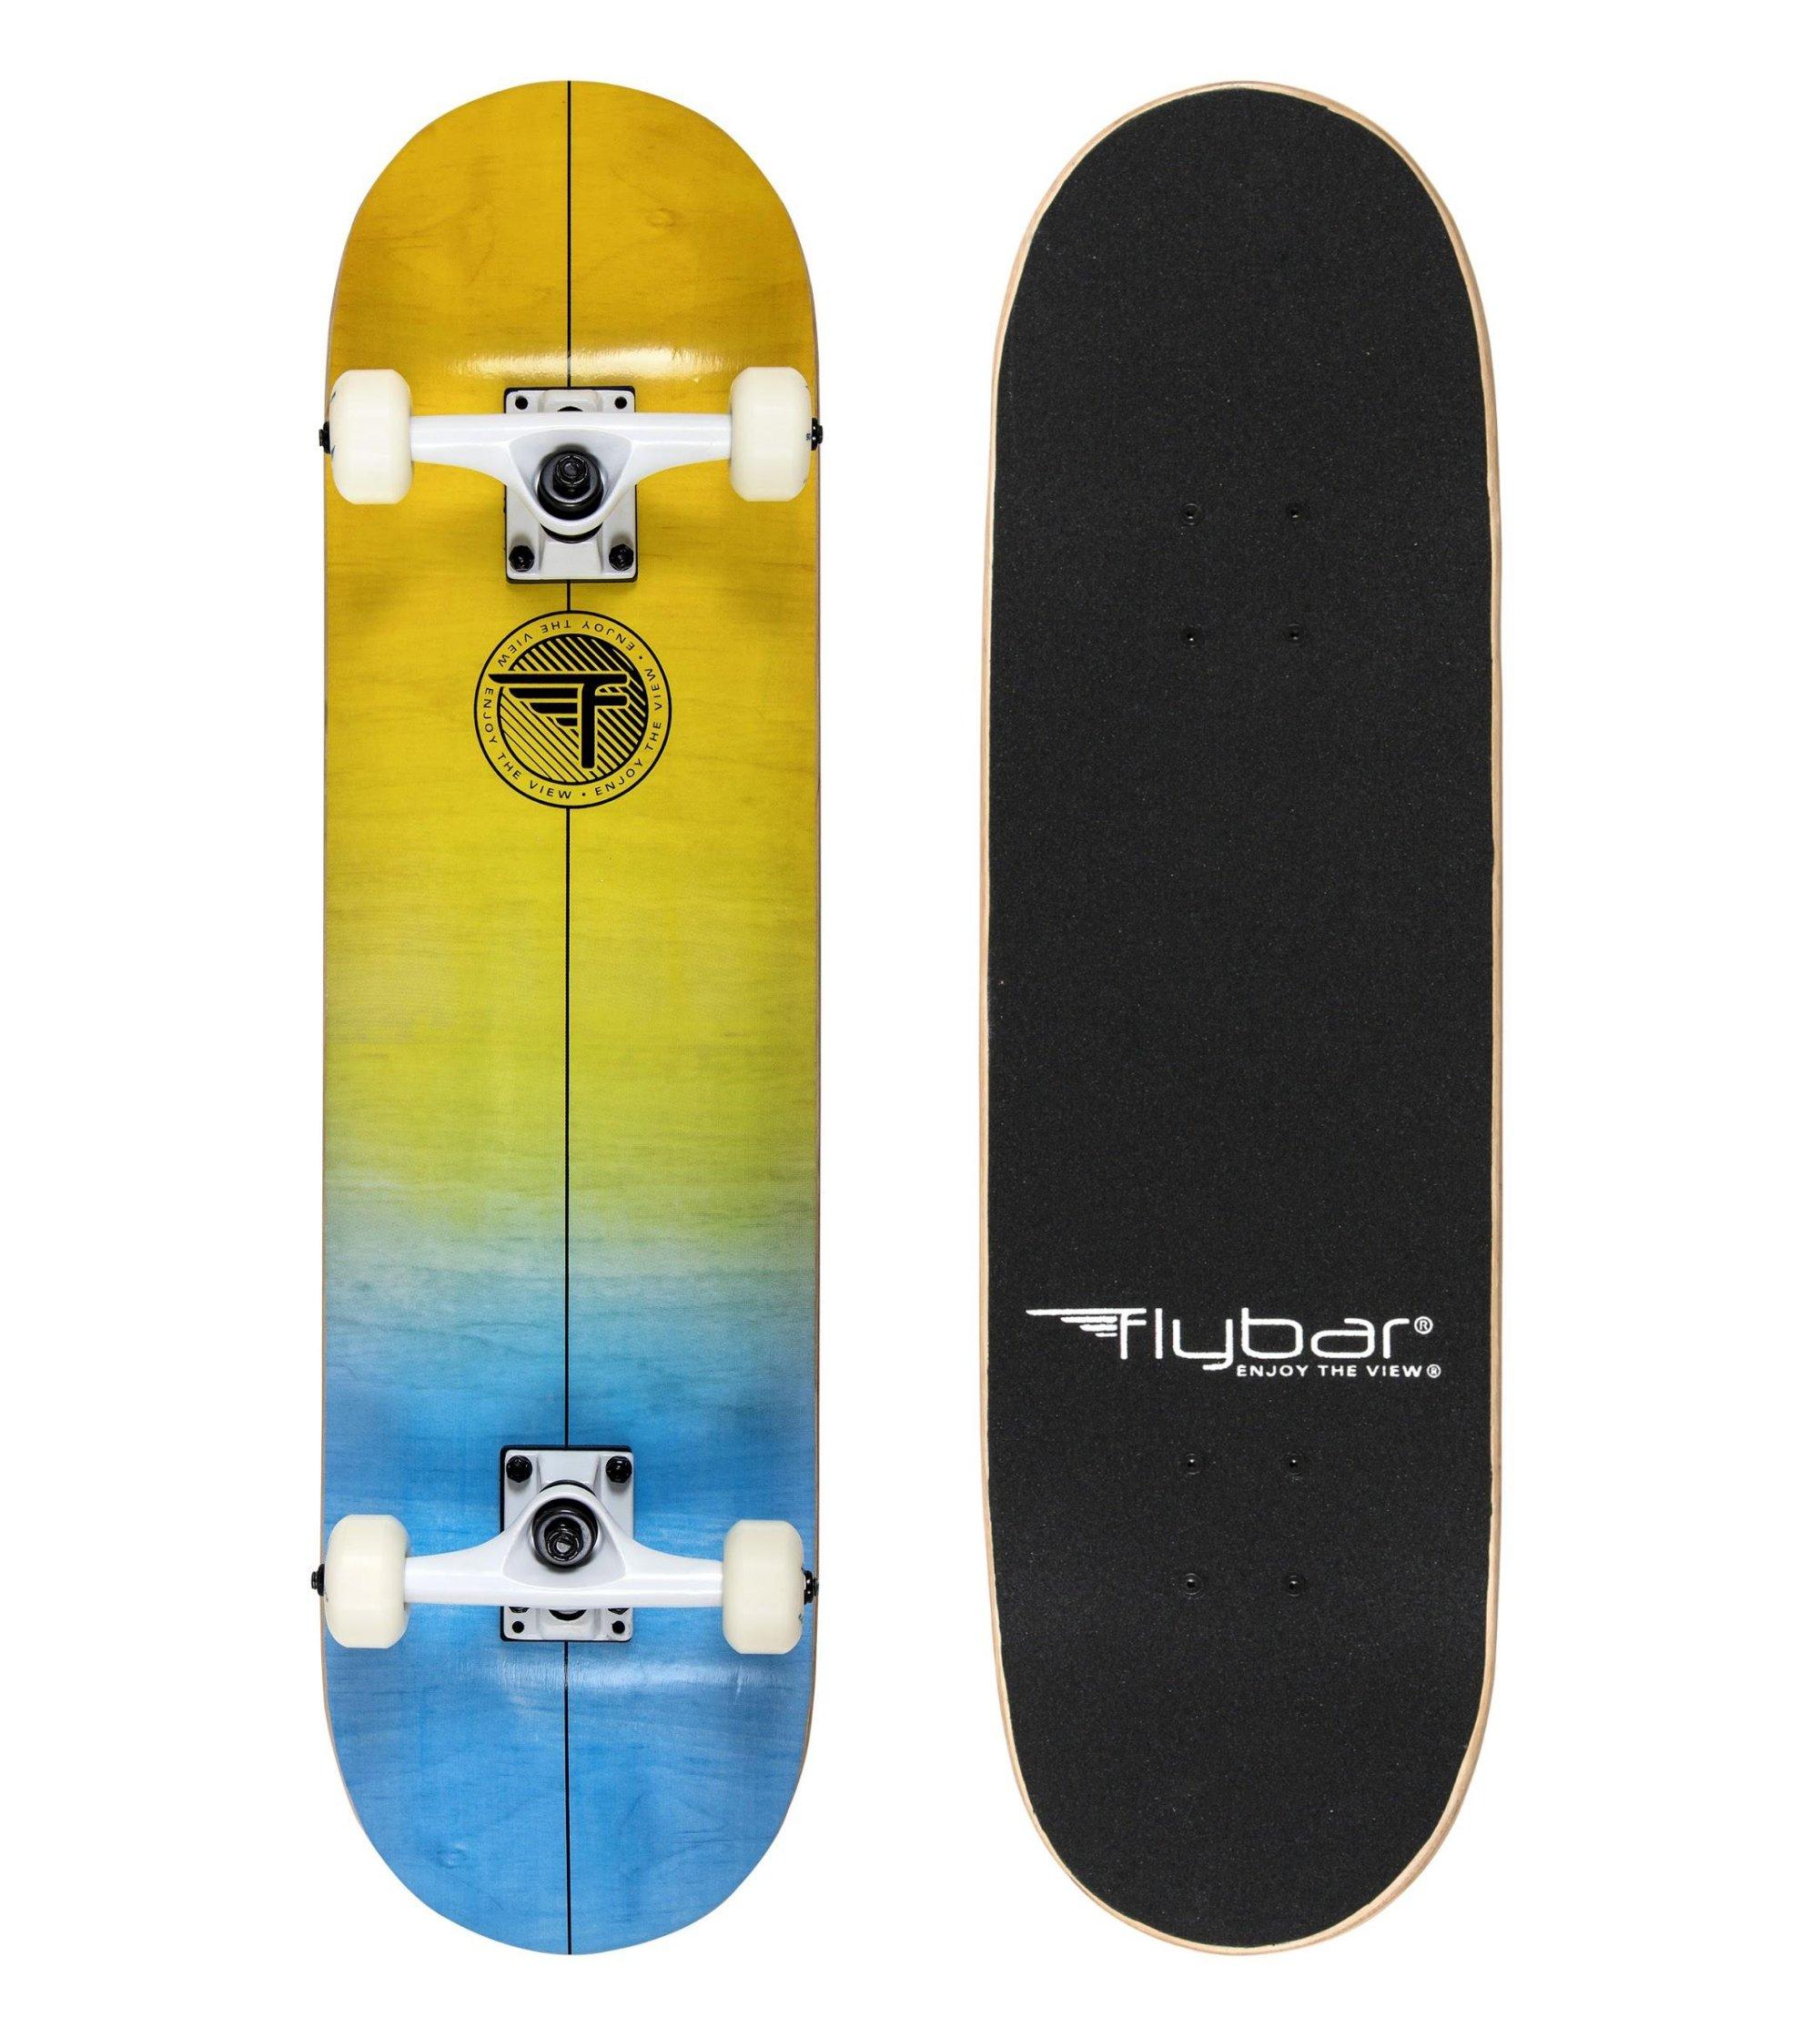 Flybar Complete Skateboards 31'' x 8'' 7 Ply Maple Wood Board (Old School 2)